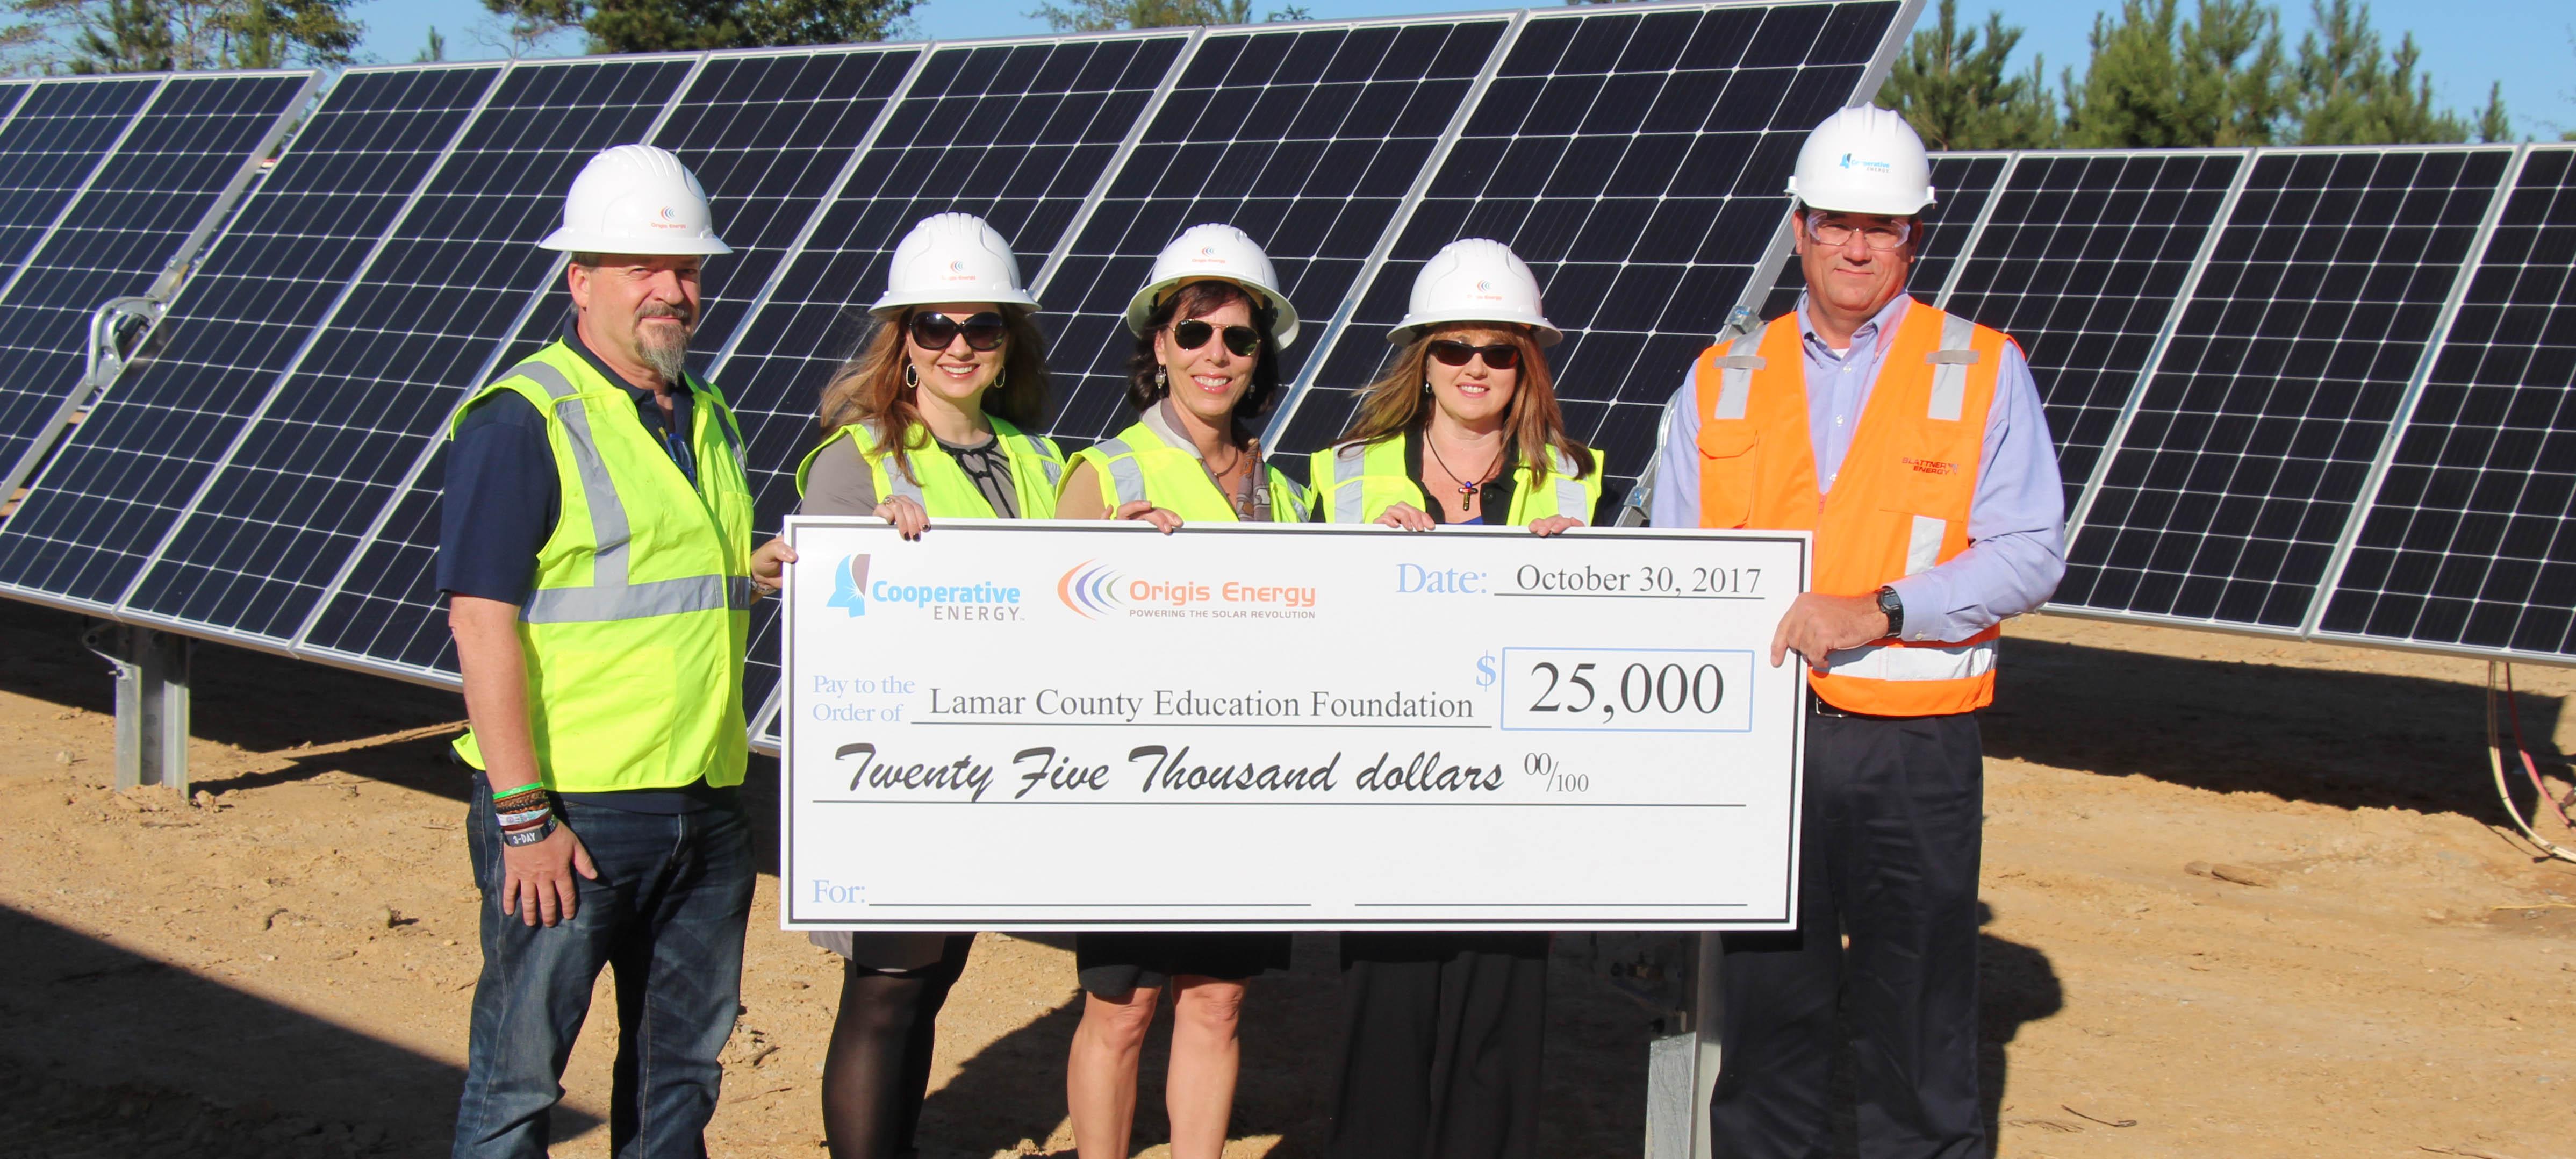 Lamar County Education Foundation Donation_2000x900 ...